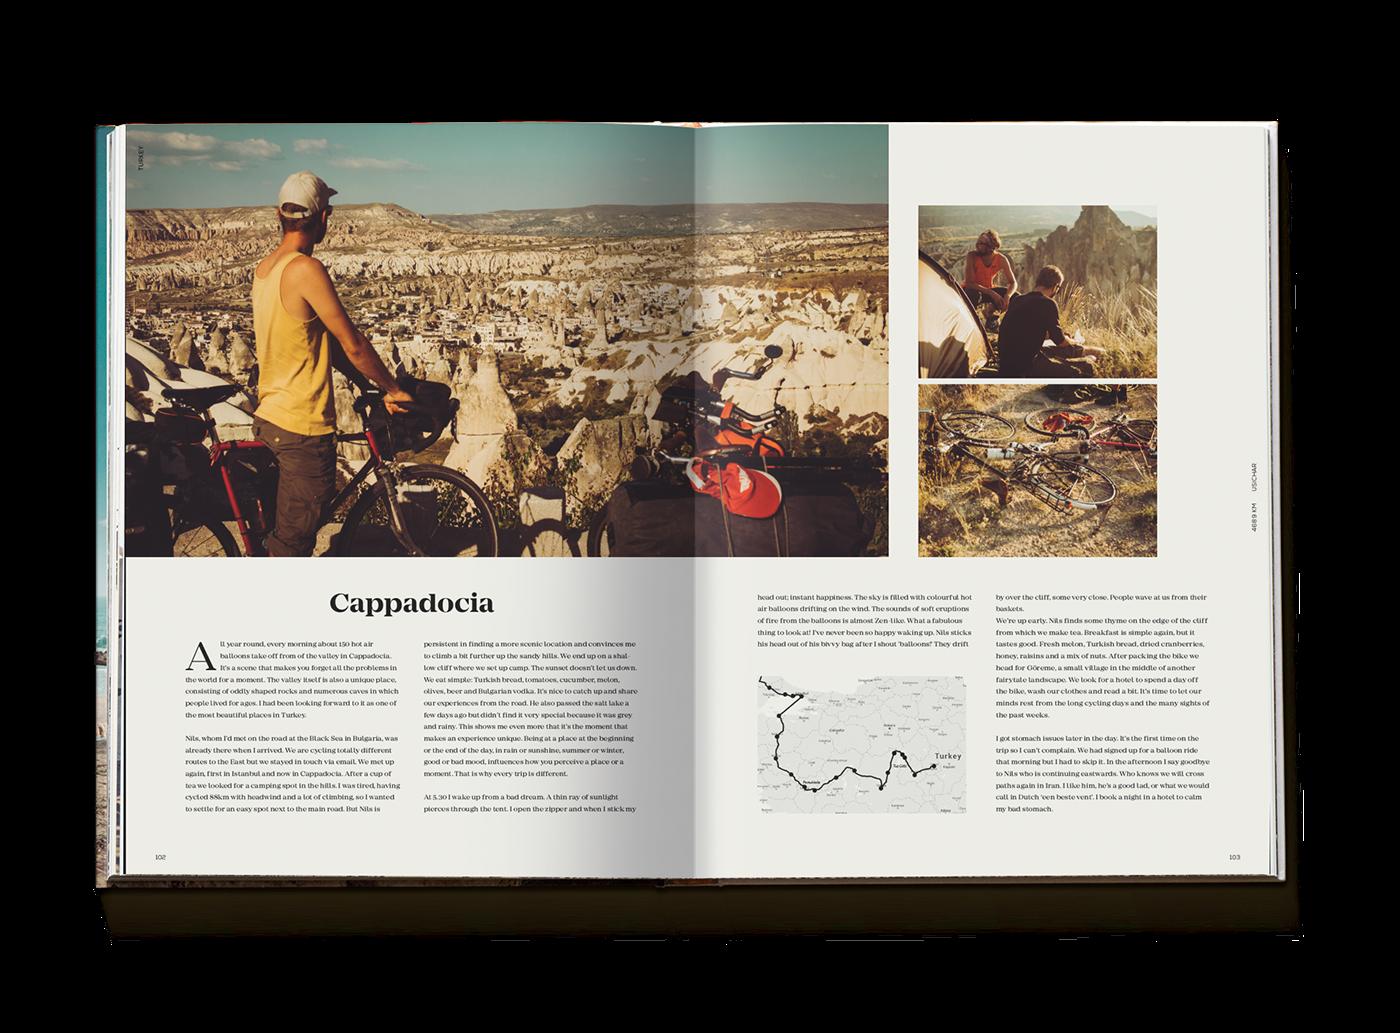 Bicycle Cycling bike touring book Photography  adventure Travel espiritu libre